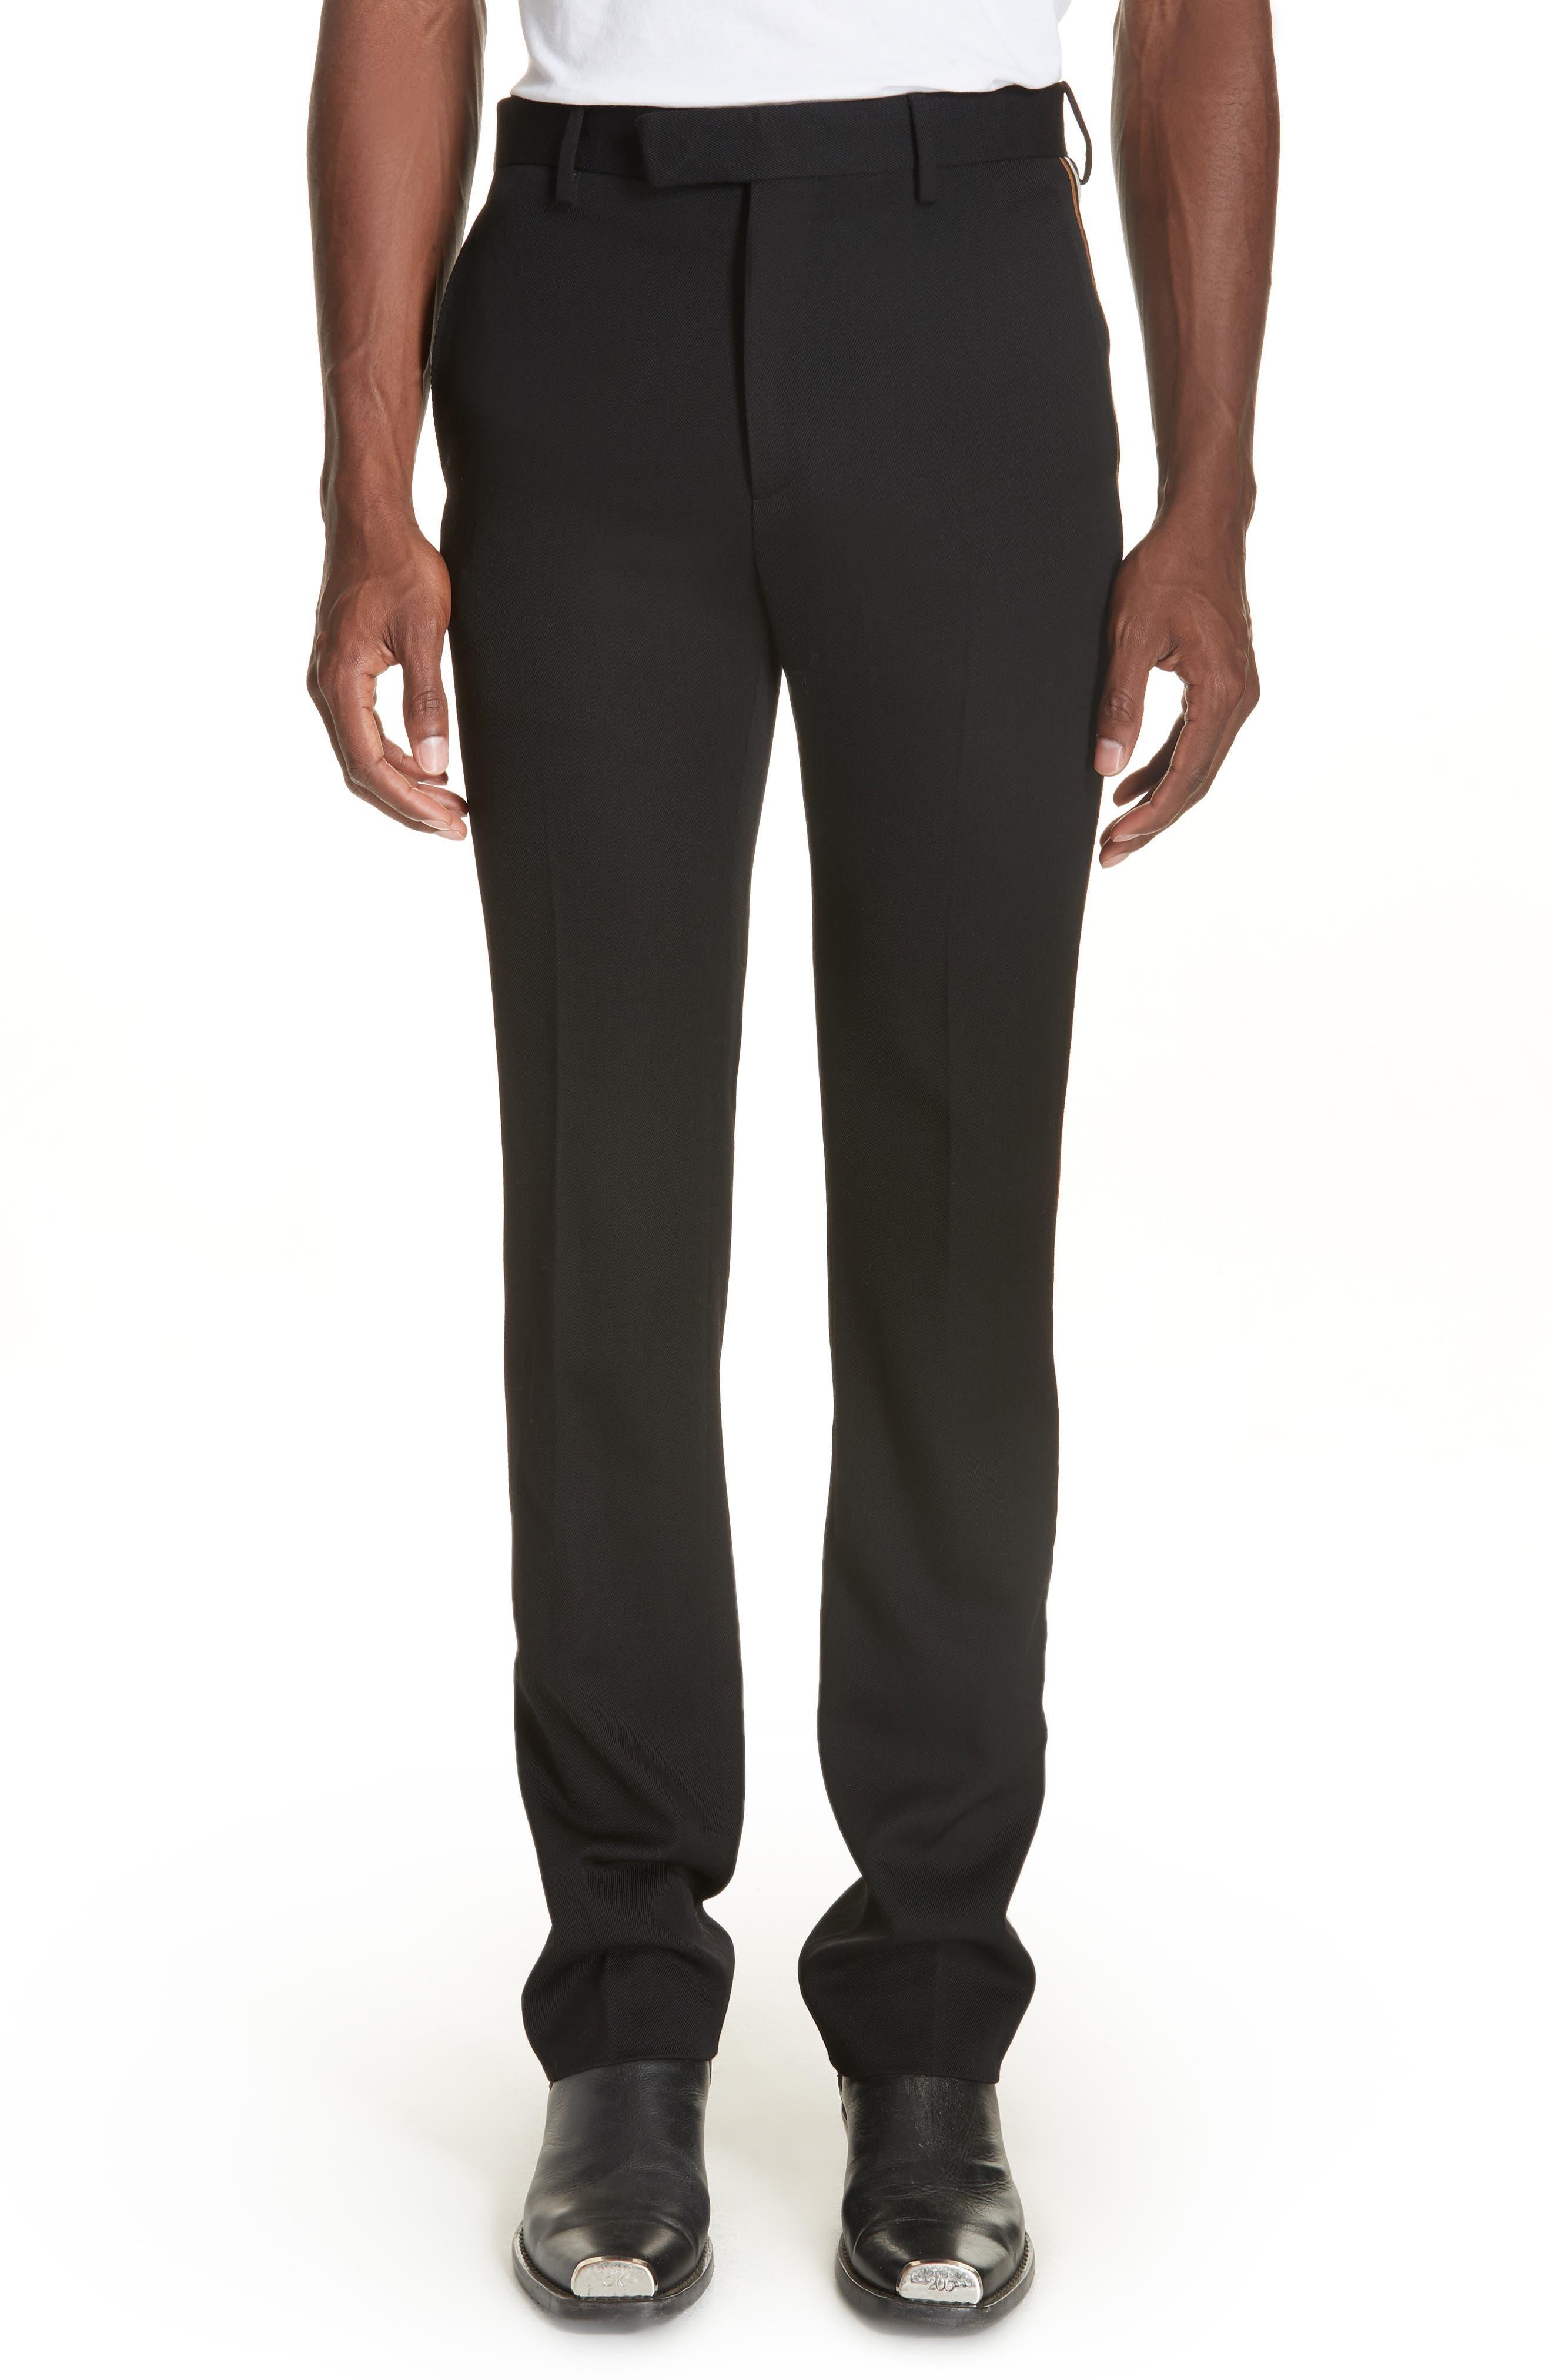 CALVIN KLEIN 205W39NYC Uniform Stripe Trousers, Main, color, 060